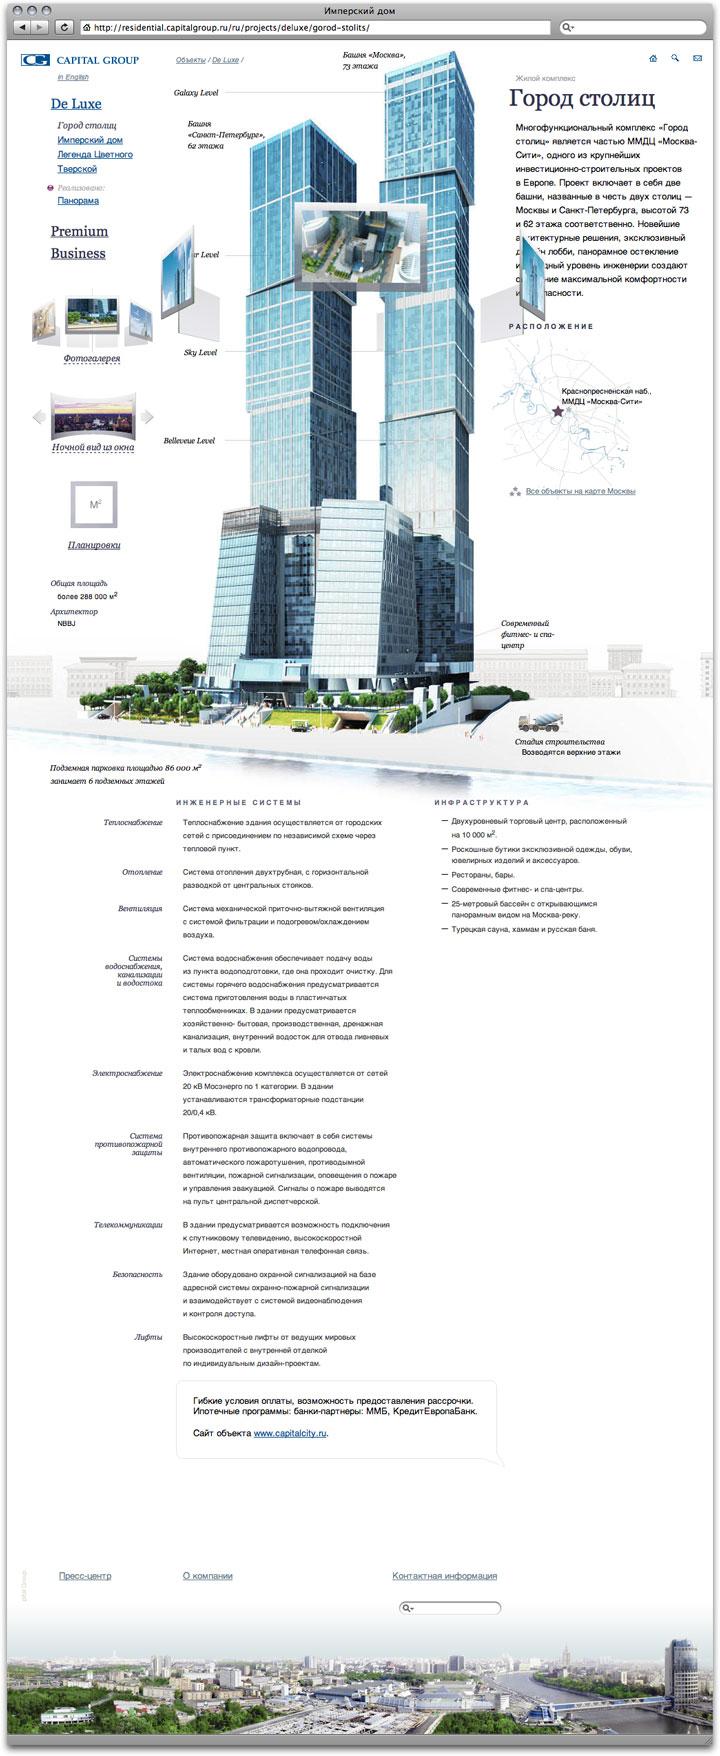 http://img.artlebedev.ru/everything/capitalgroup/site/capital-gorod-stolits.jpg